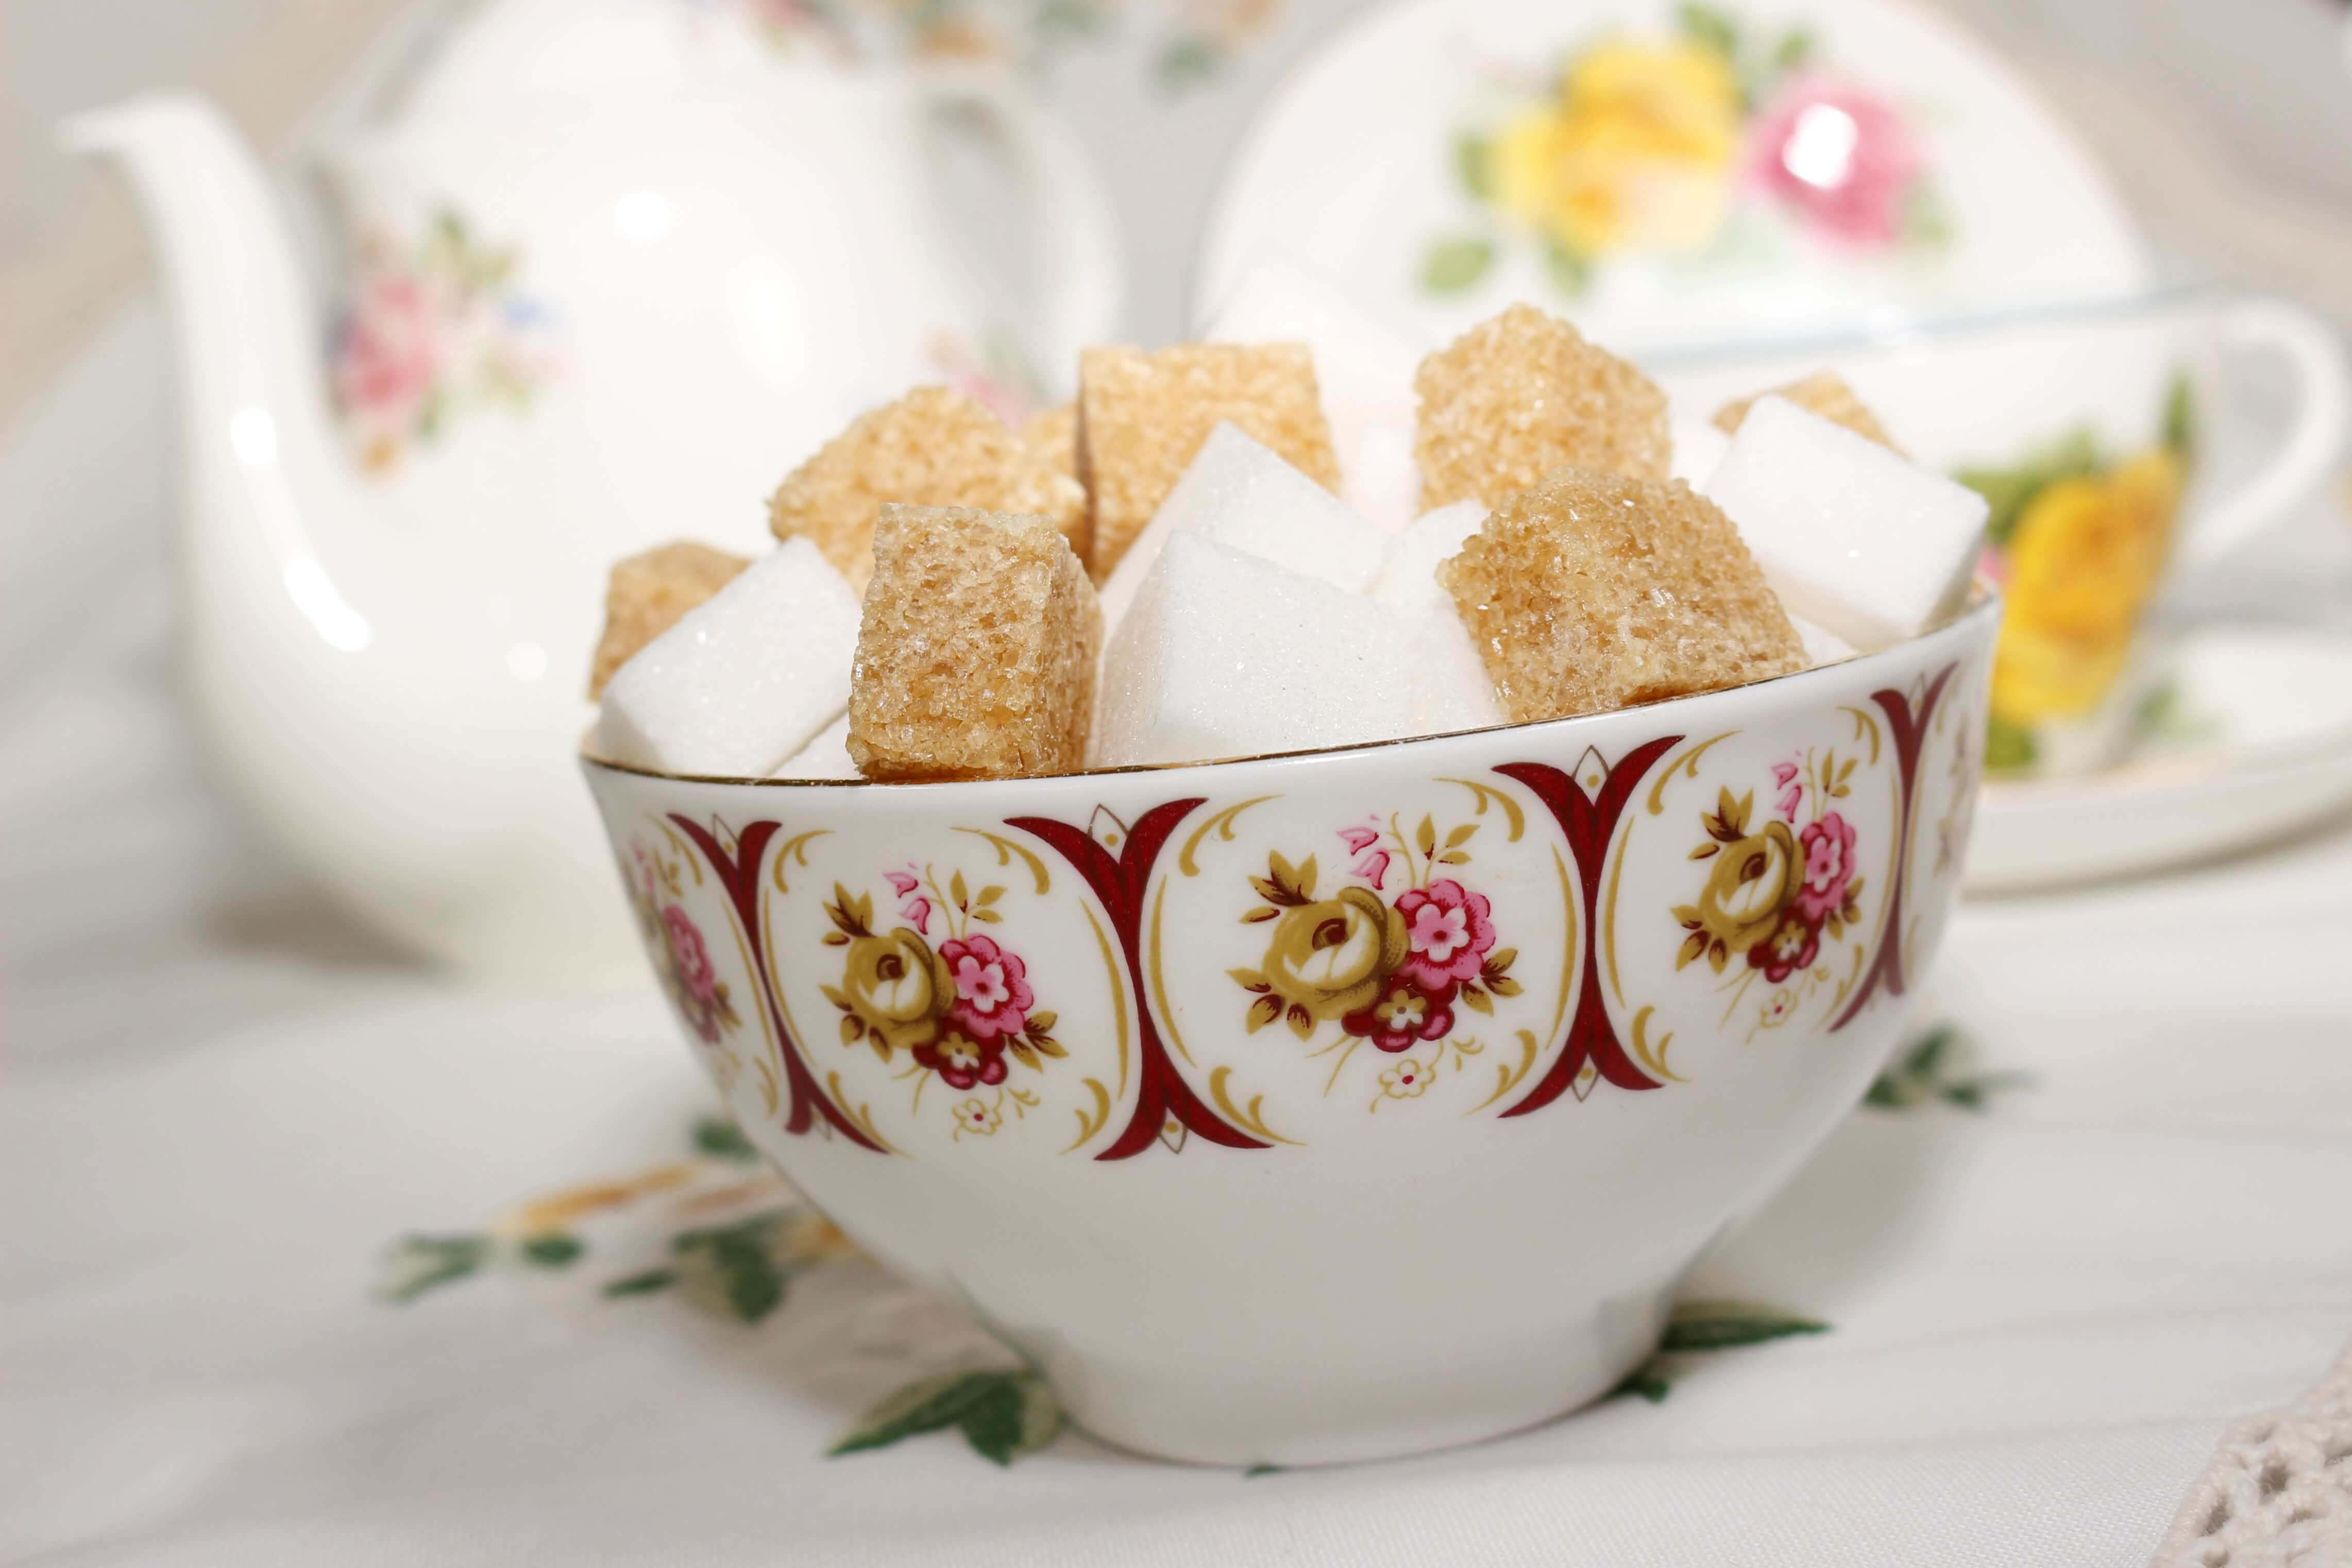 A Vintage Sugar Bowl filled with Sugar Cubes